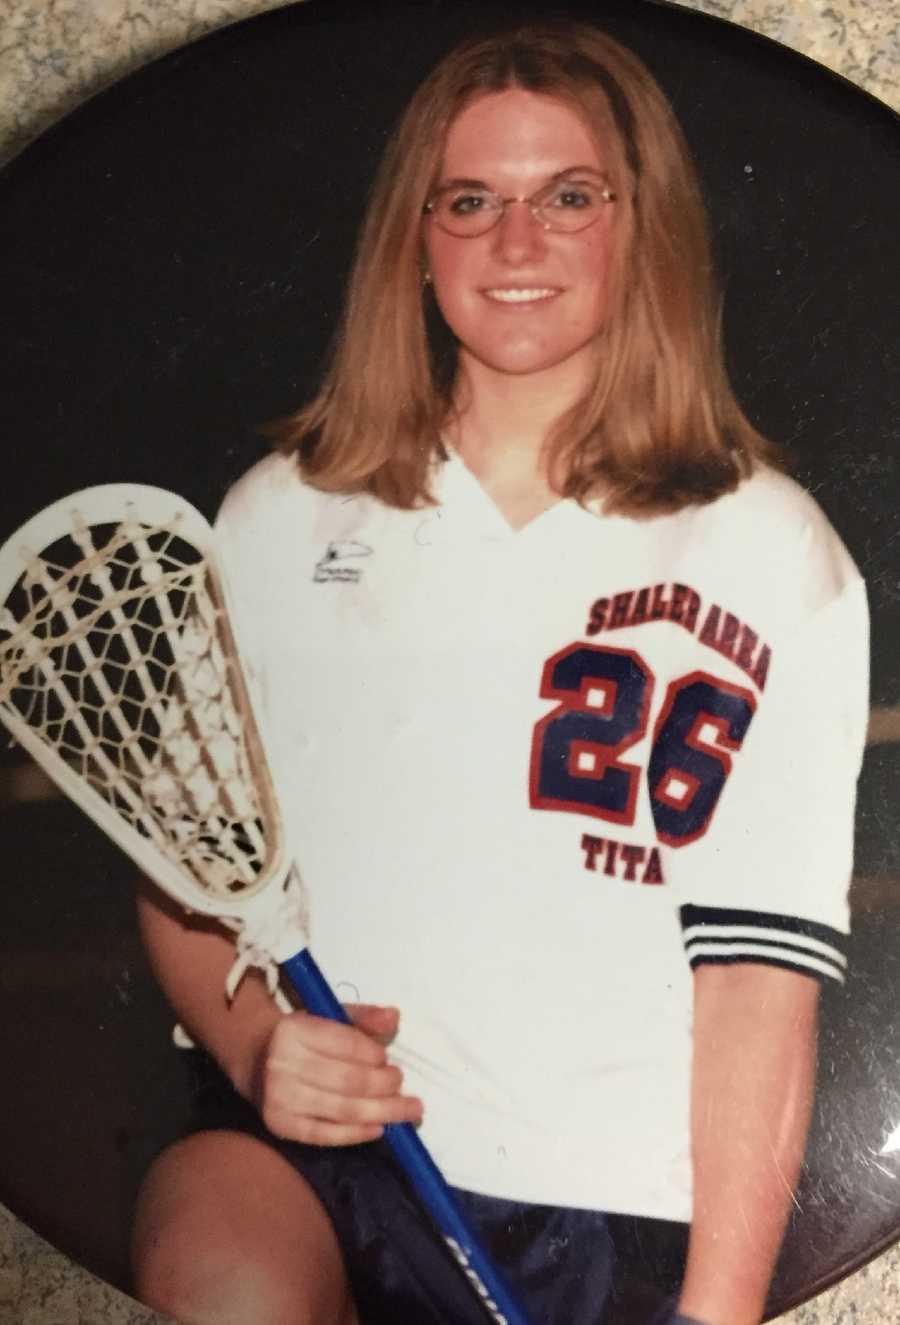 KATELYN SYKES - Shaler High School - Shaler Township, PA - Lacrosse - Wing